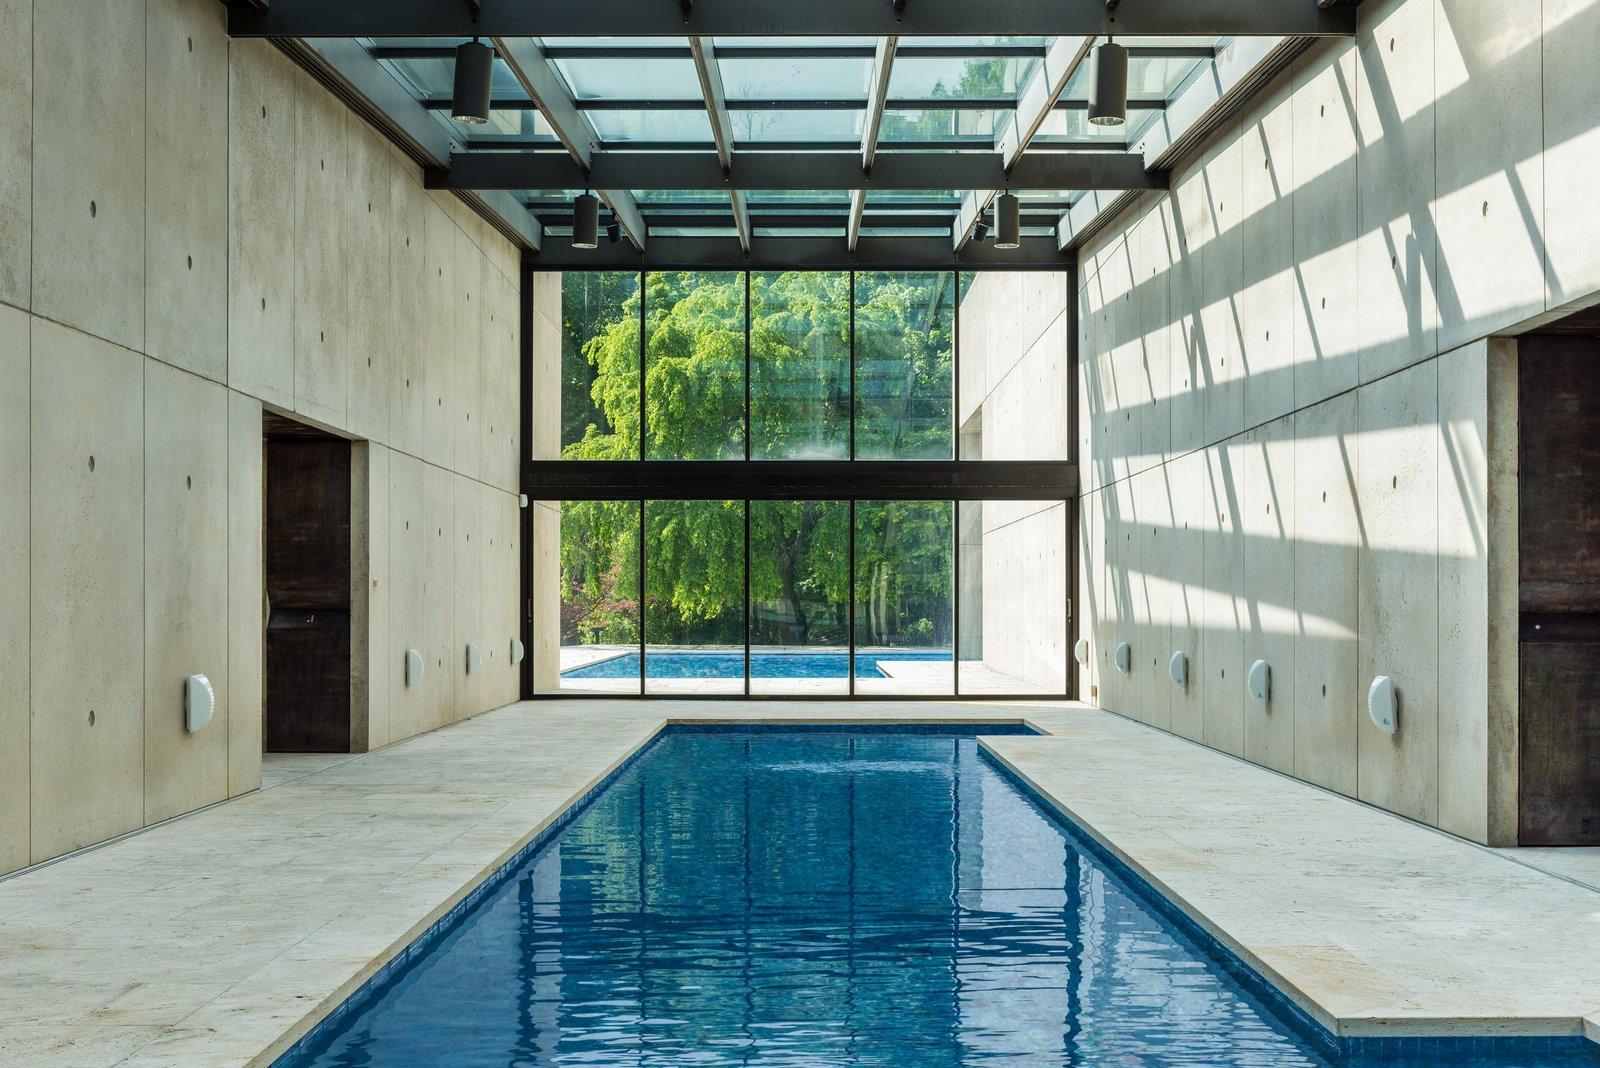 Rafael Viñoly Connecticut residence pool